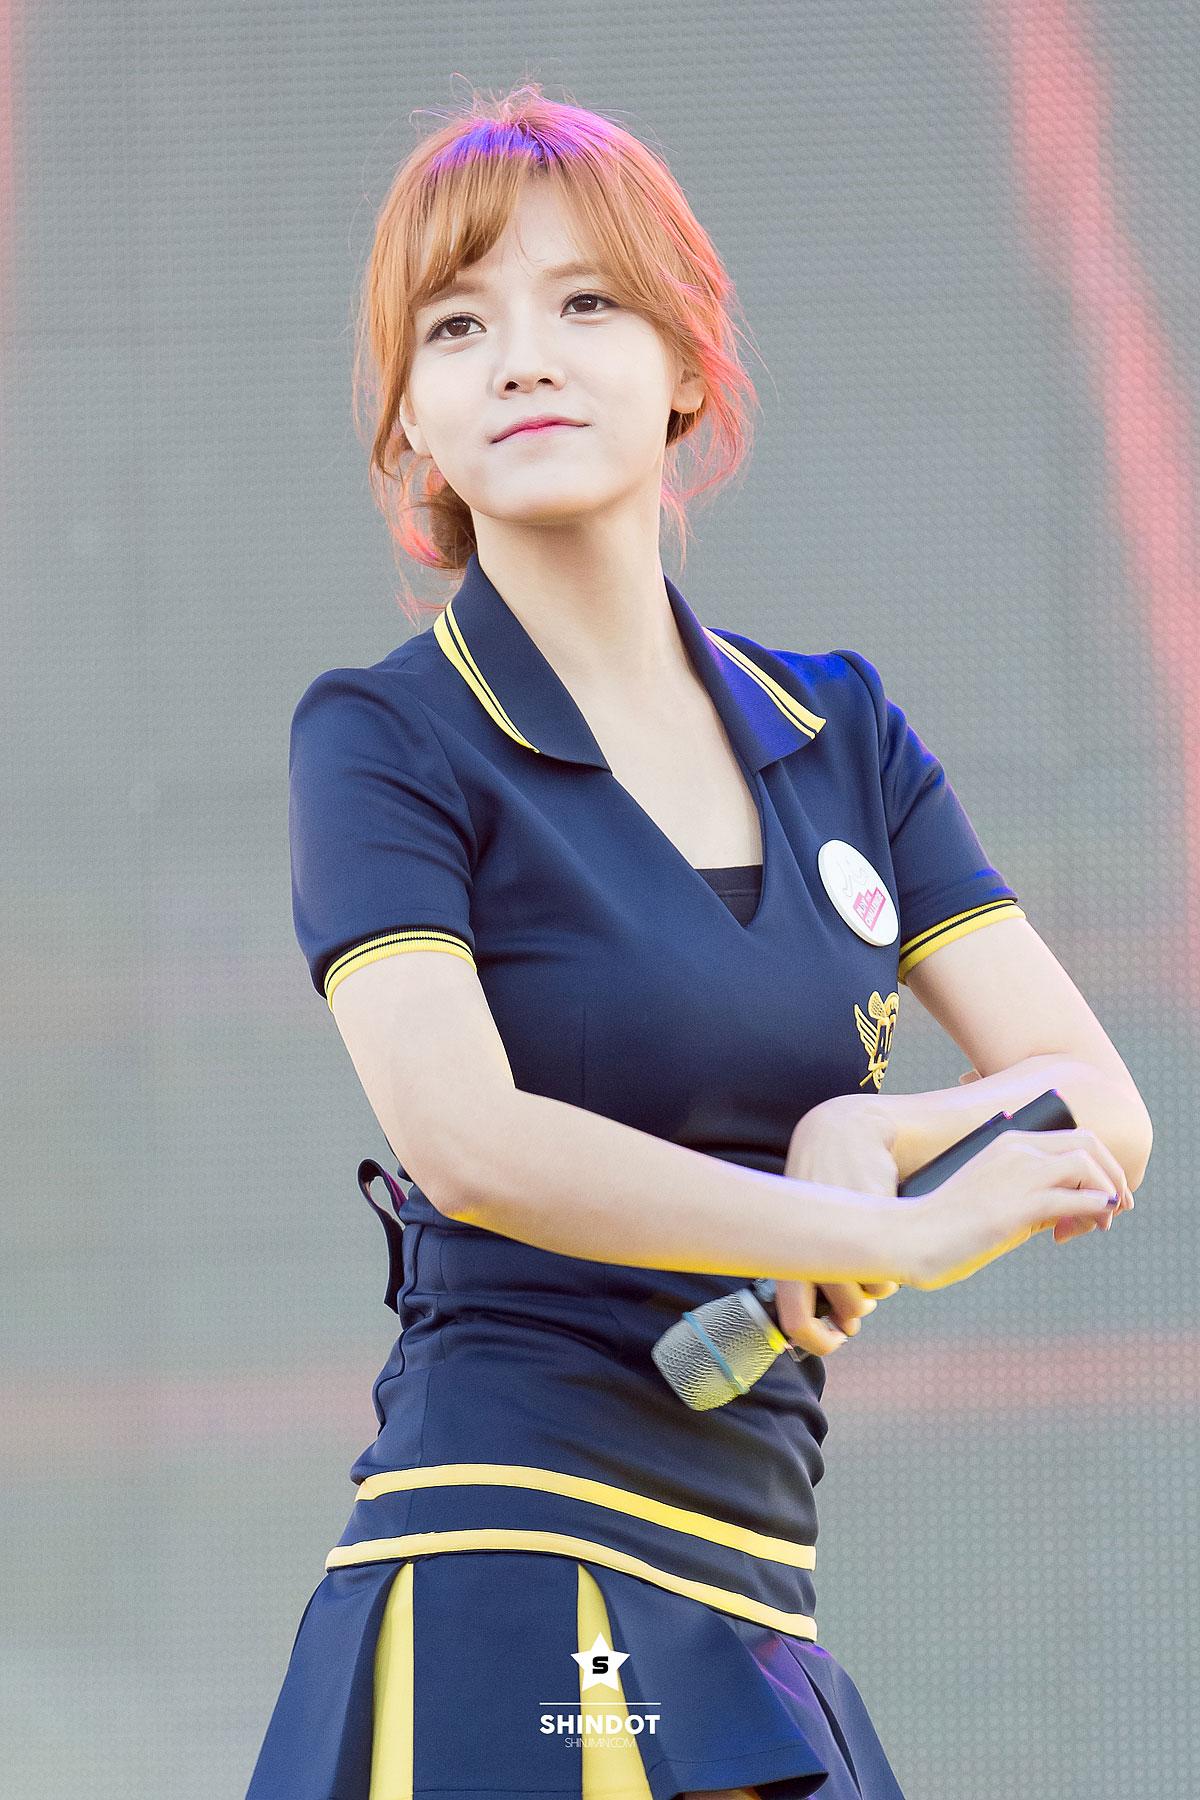 AOA Jimin Samsung Play The Challenge Concert